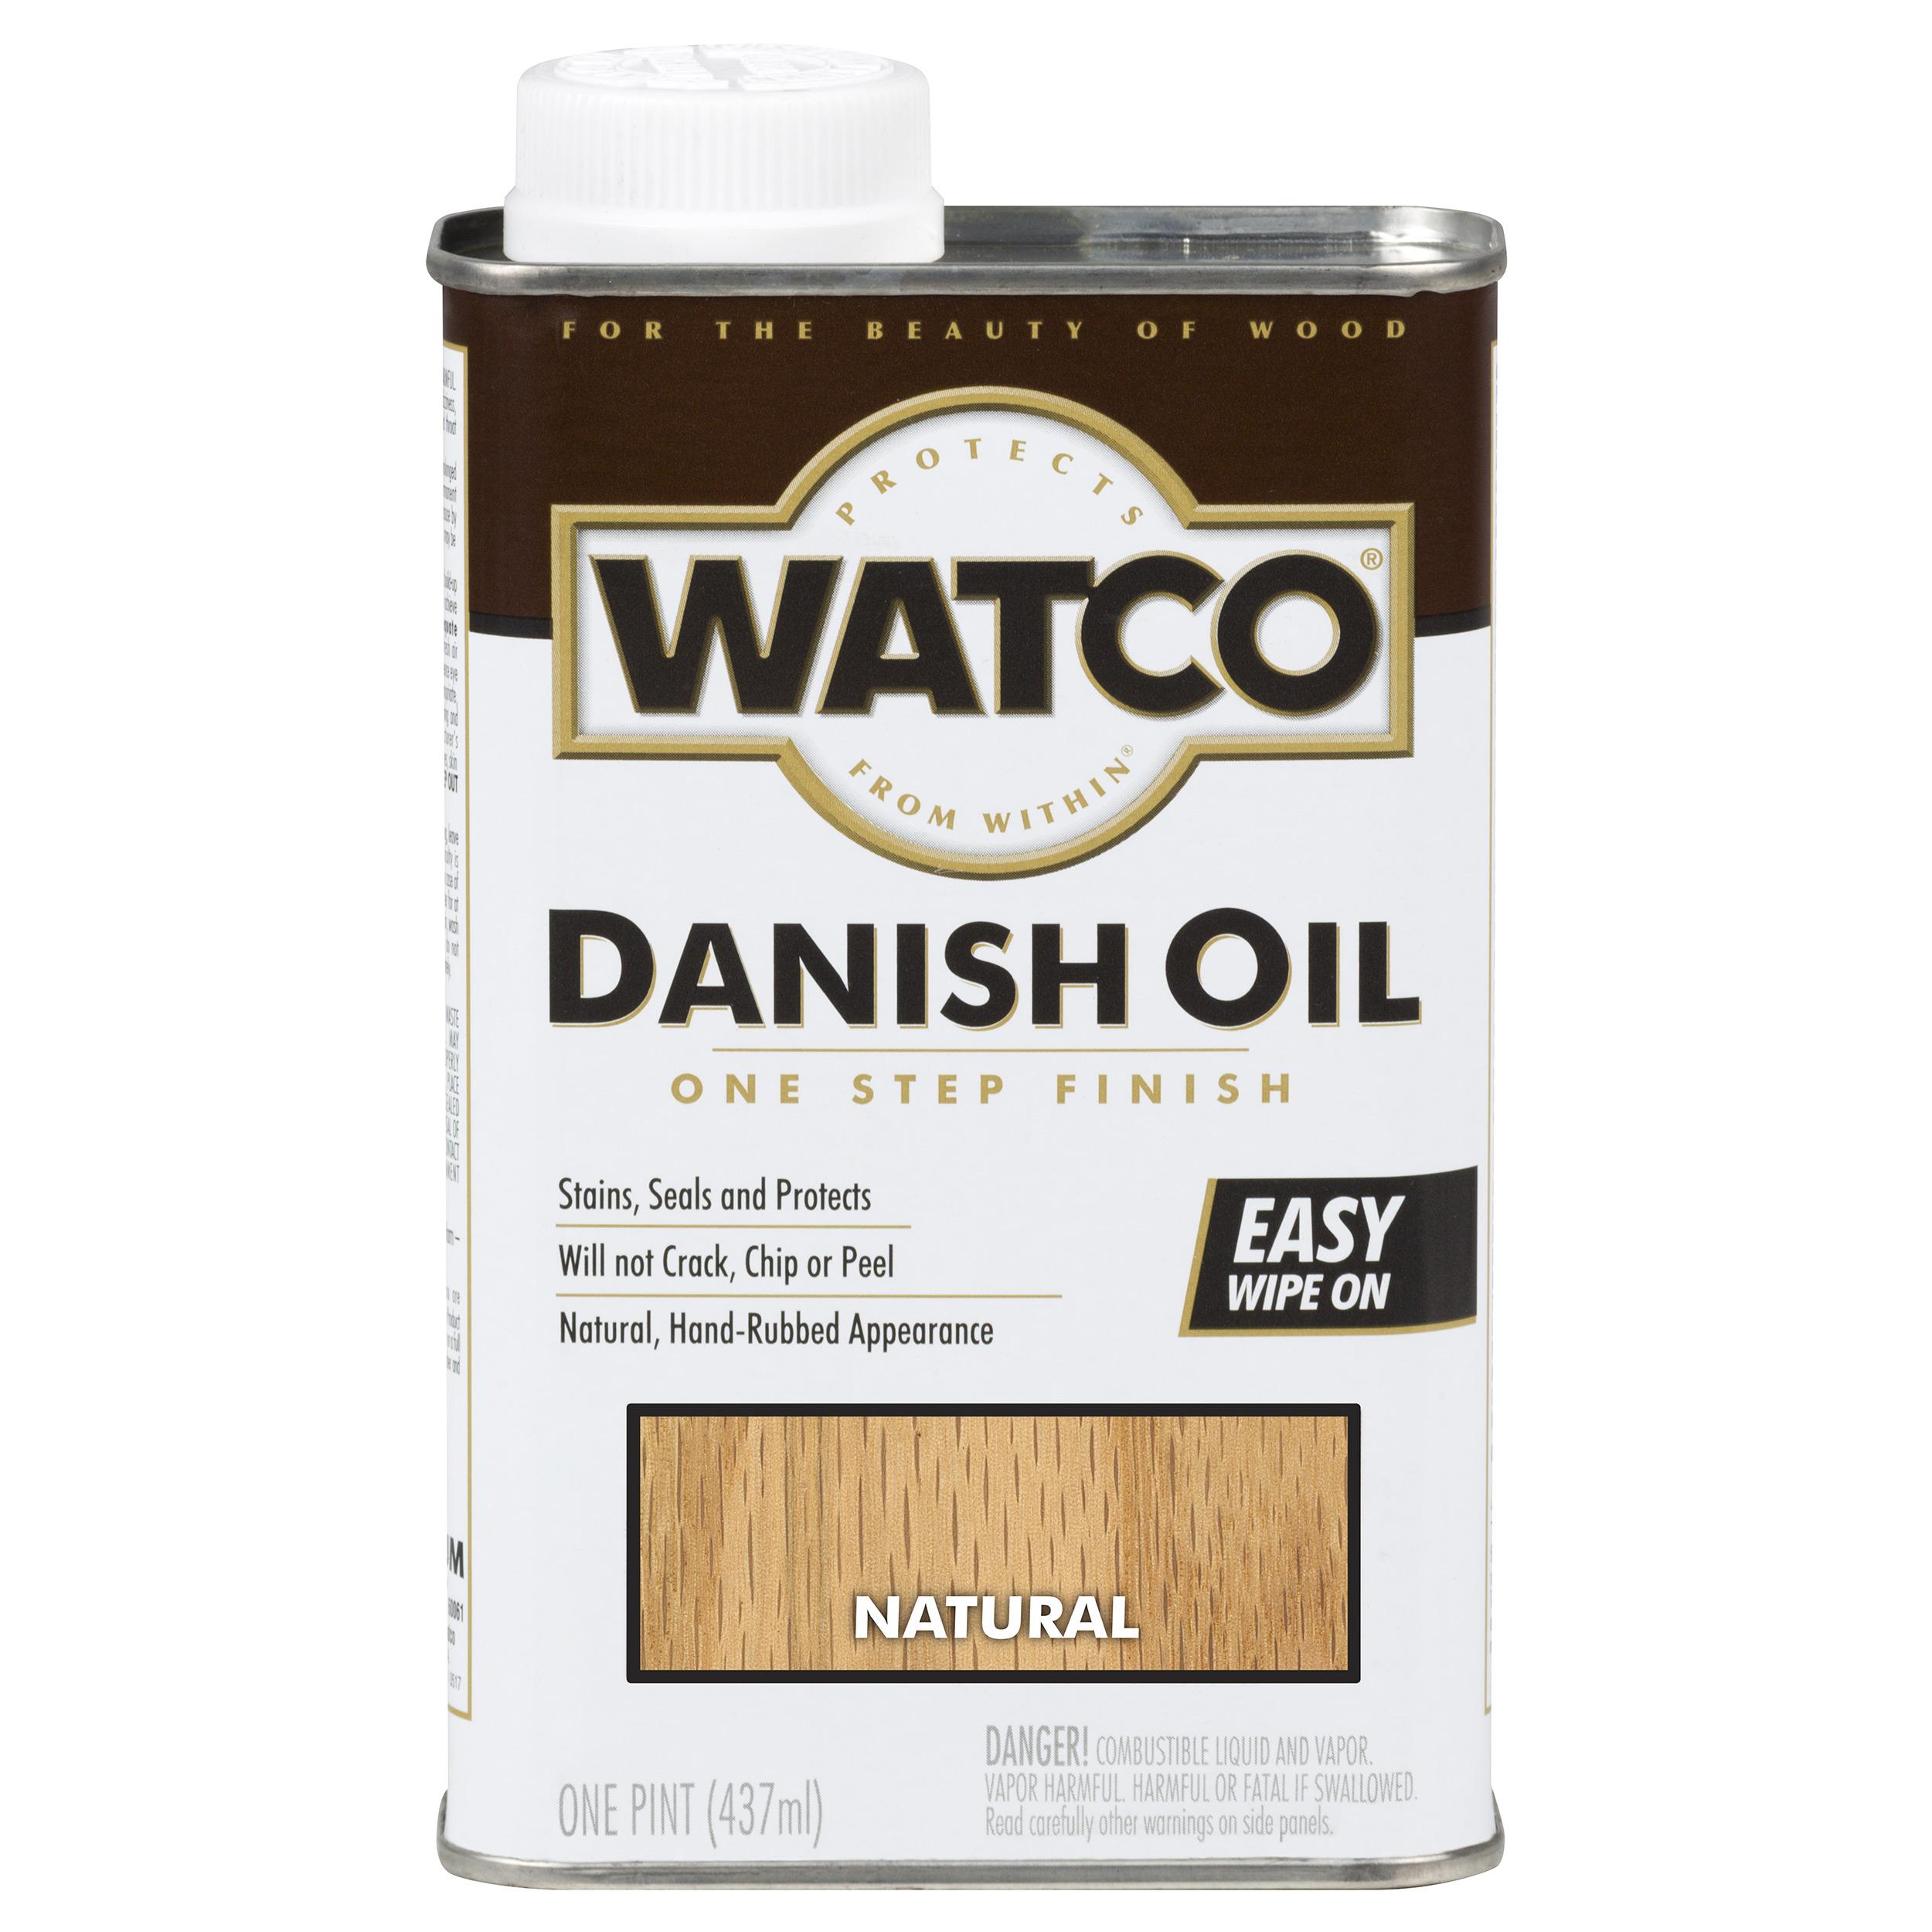 Natural Danish Oil Solvent Based Pint